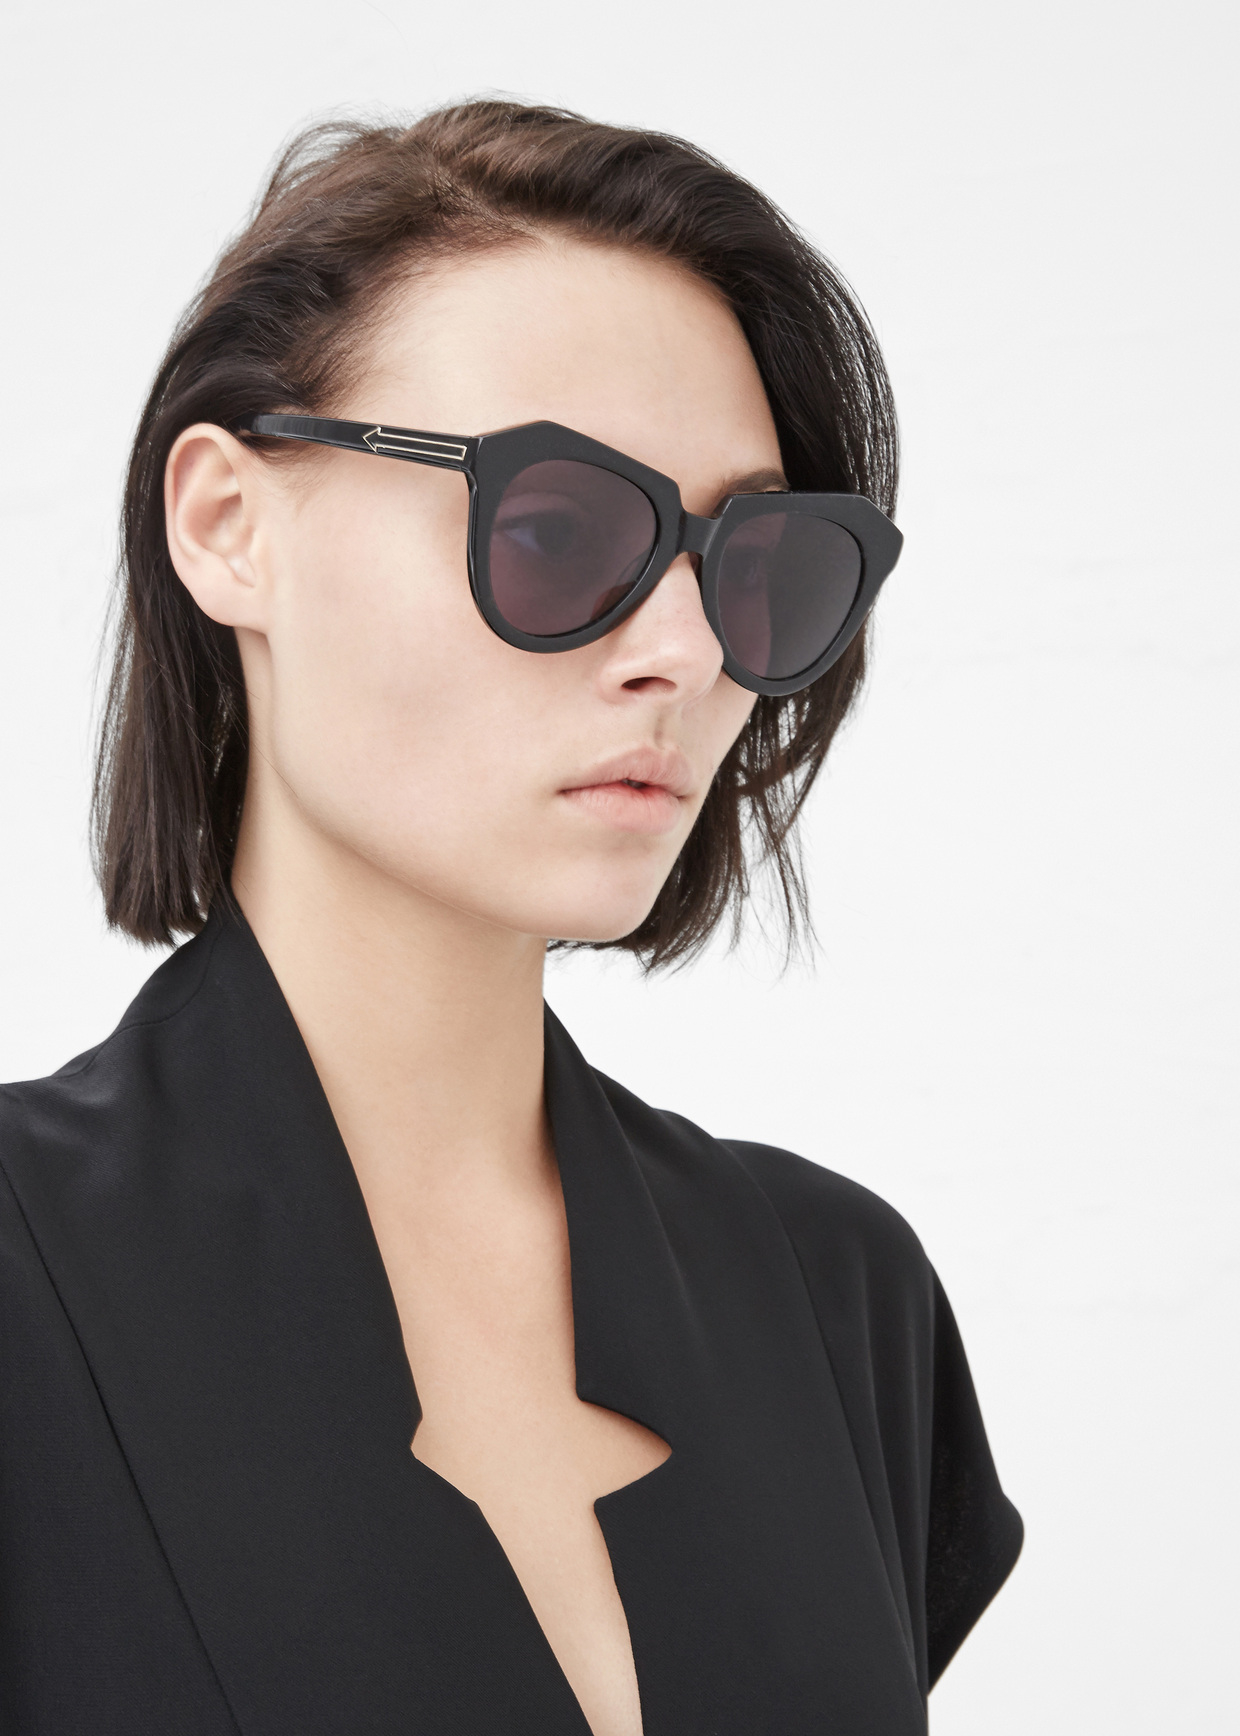 b9dfb65c78ec Karen Walker Black Number One Sunglasses in Black - Lyst